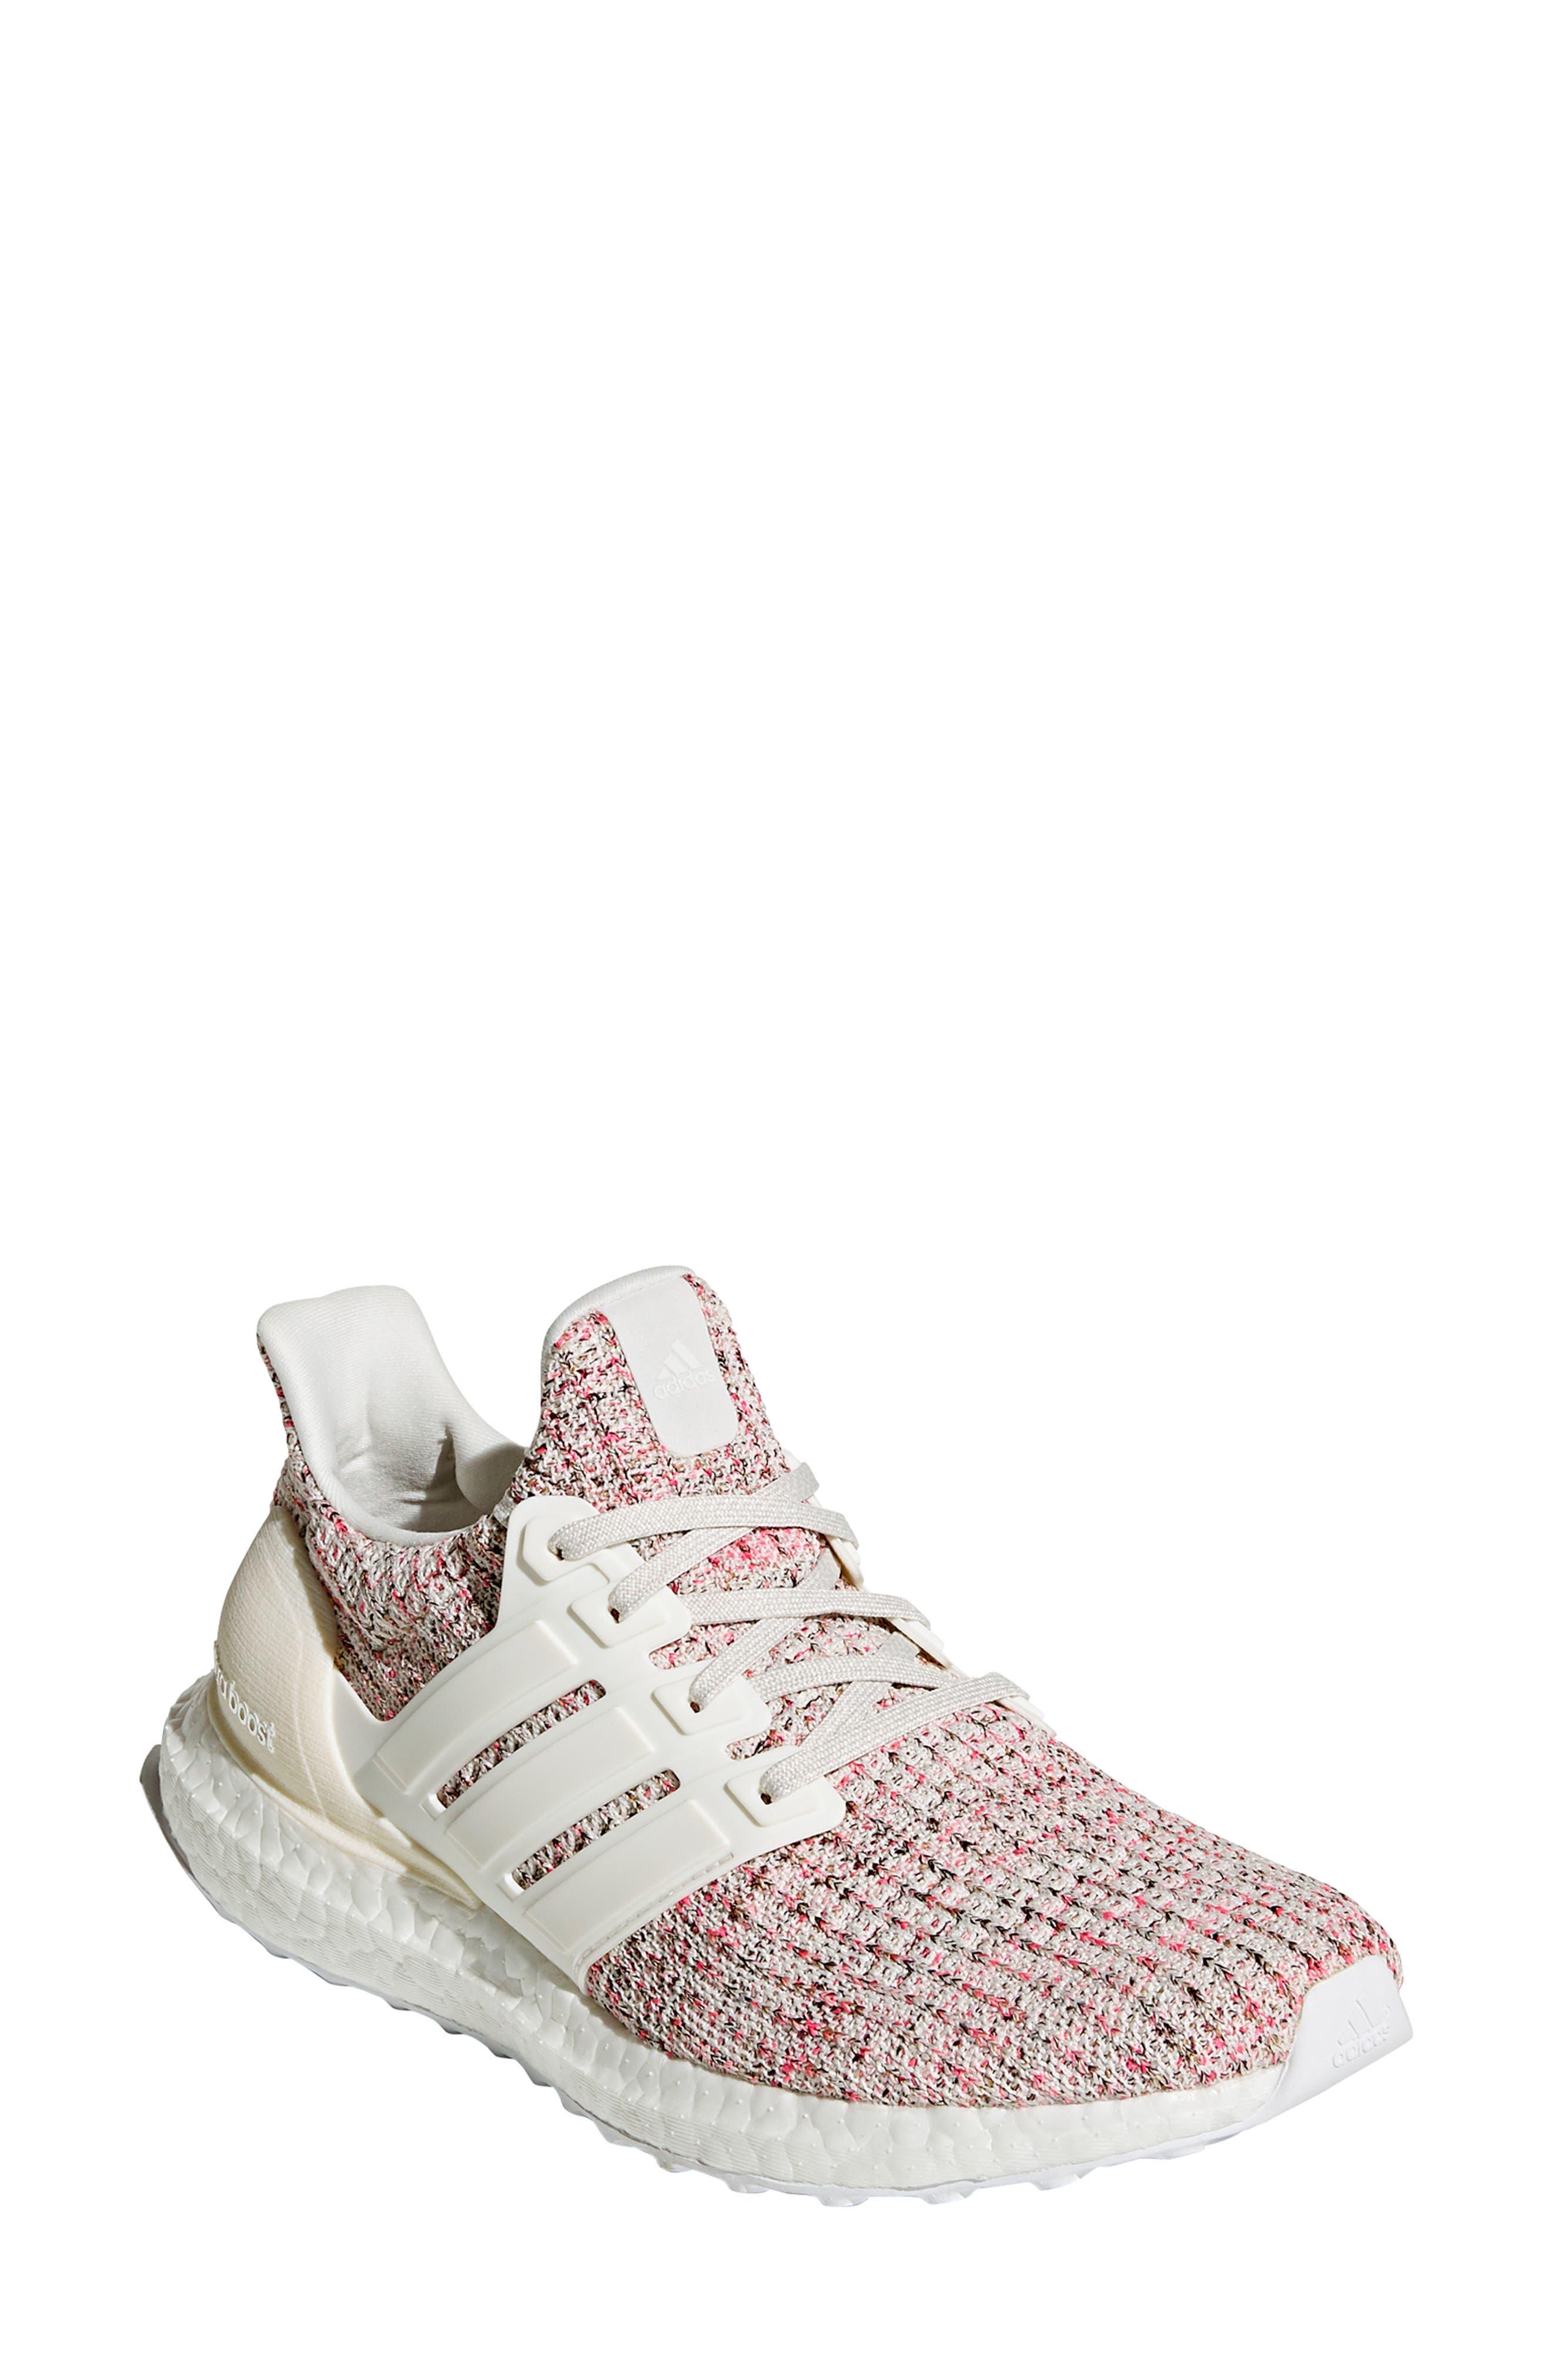 97fd4288783 Women s Adidas Shoes